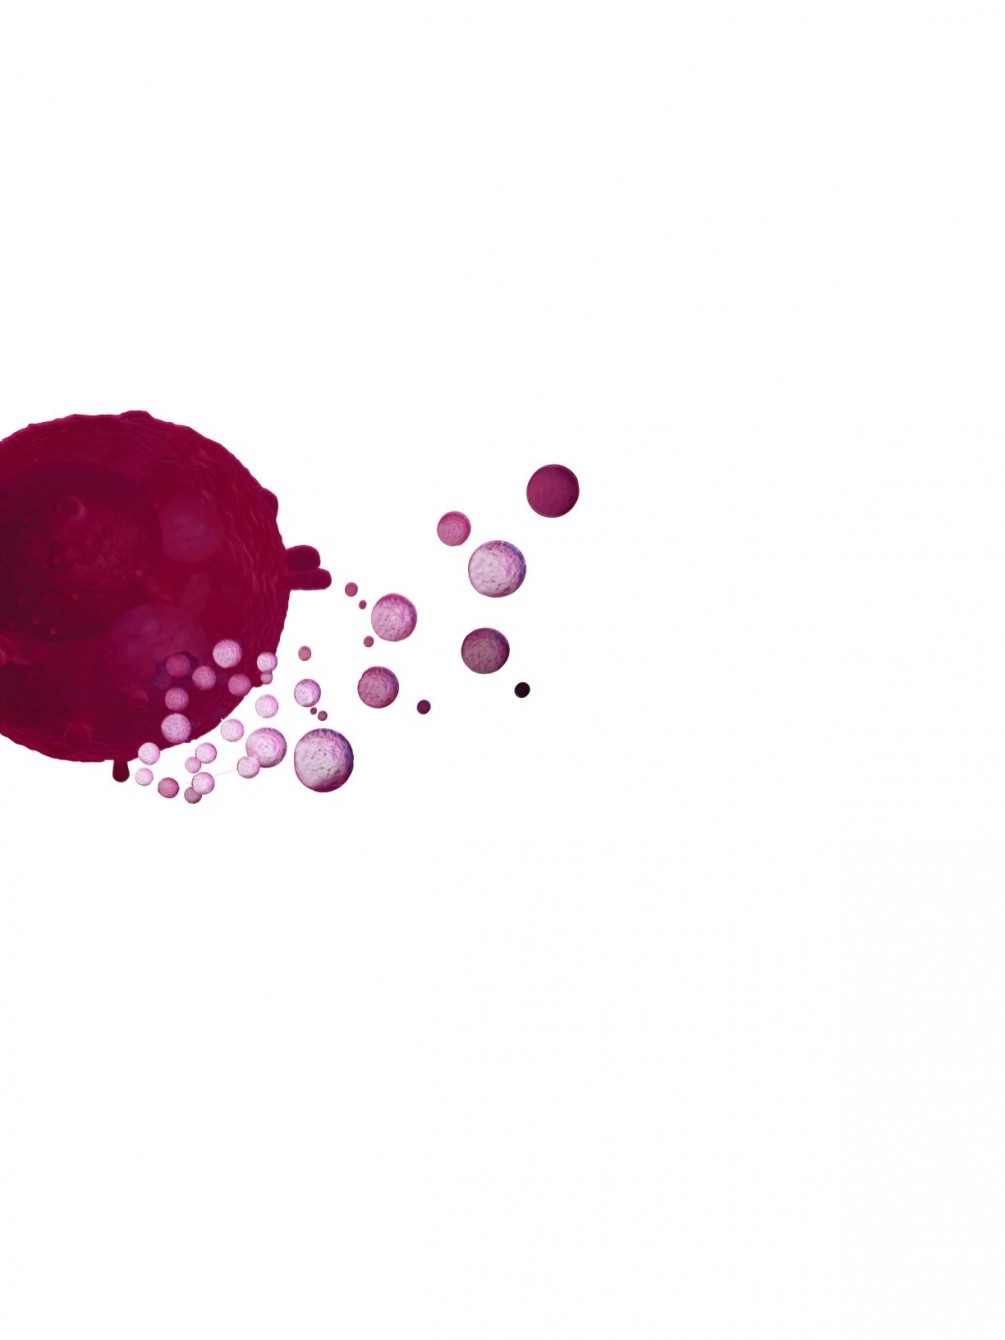 Exosome/EVs 的鑑定和實驗要求? 細胞培養上清液的製備?